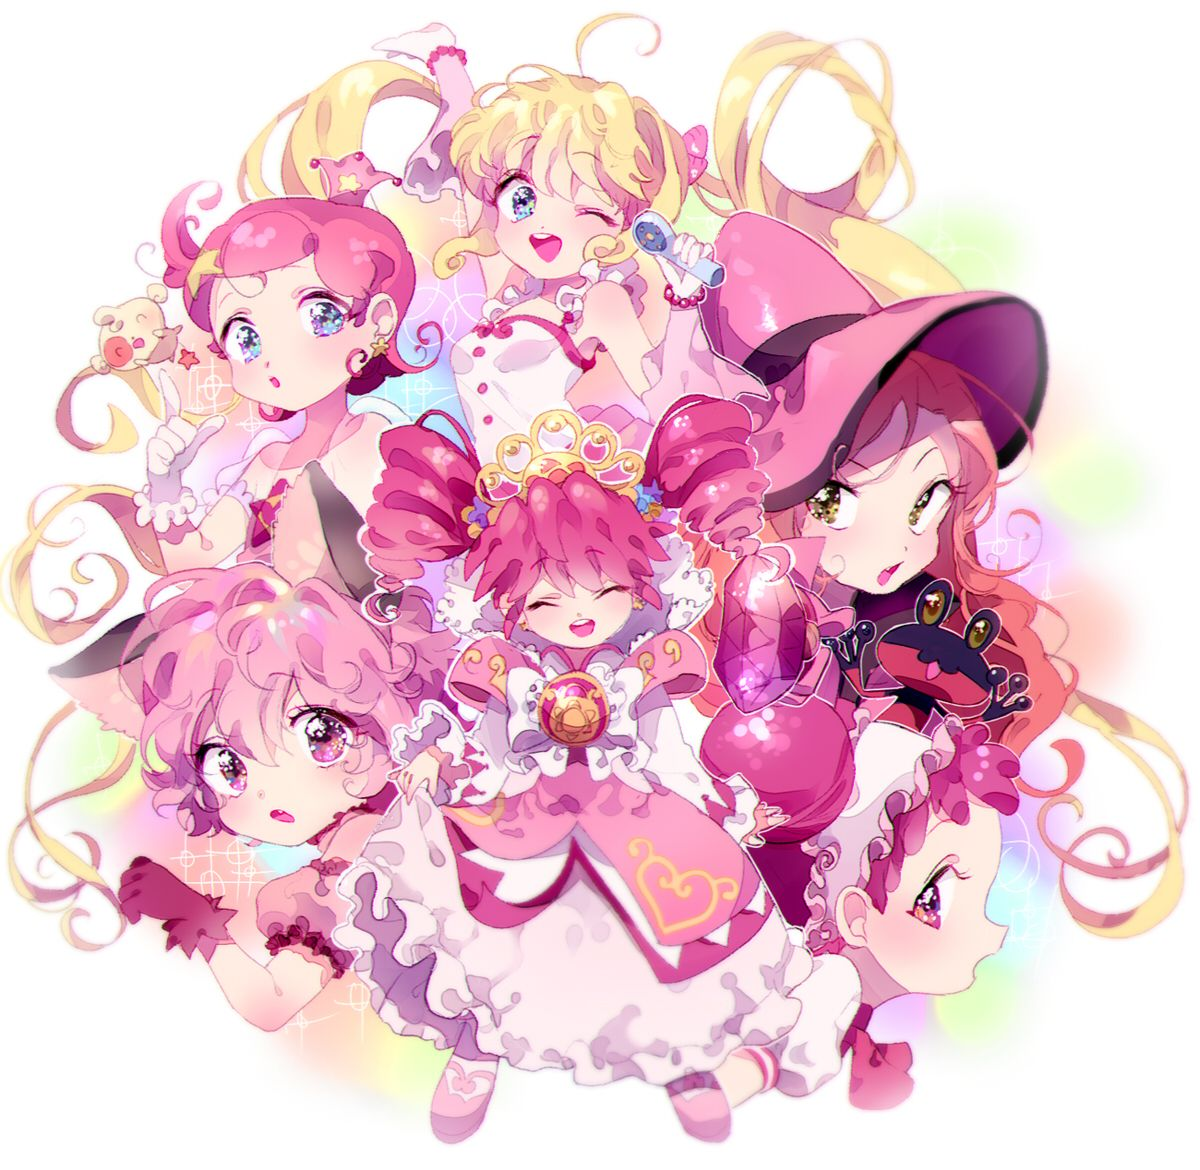 Inhye, Princess Comet, Mermaid Melody Pichi Pichi Pitch